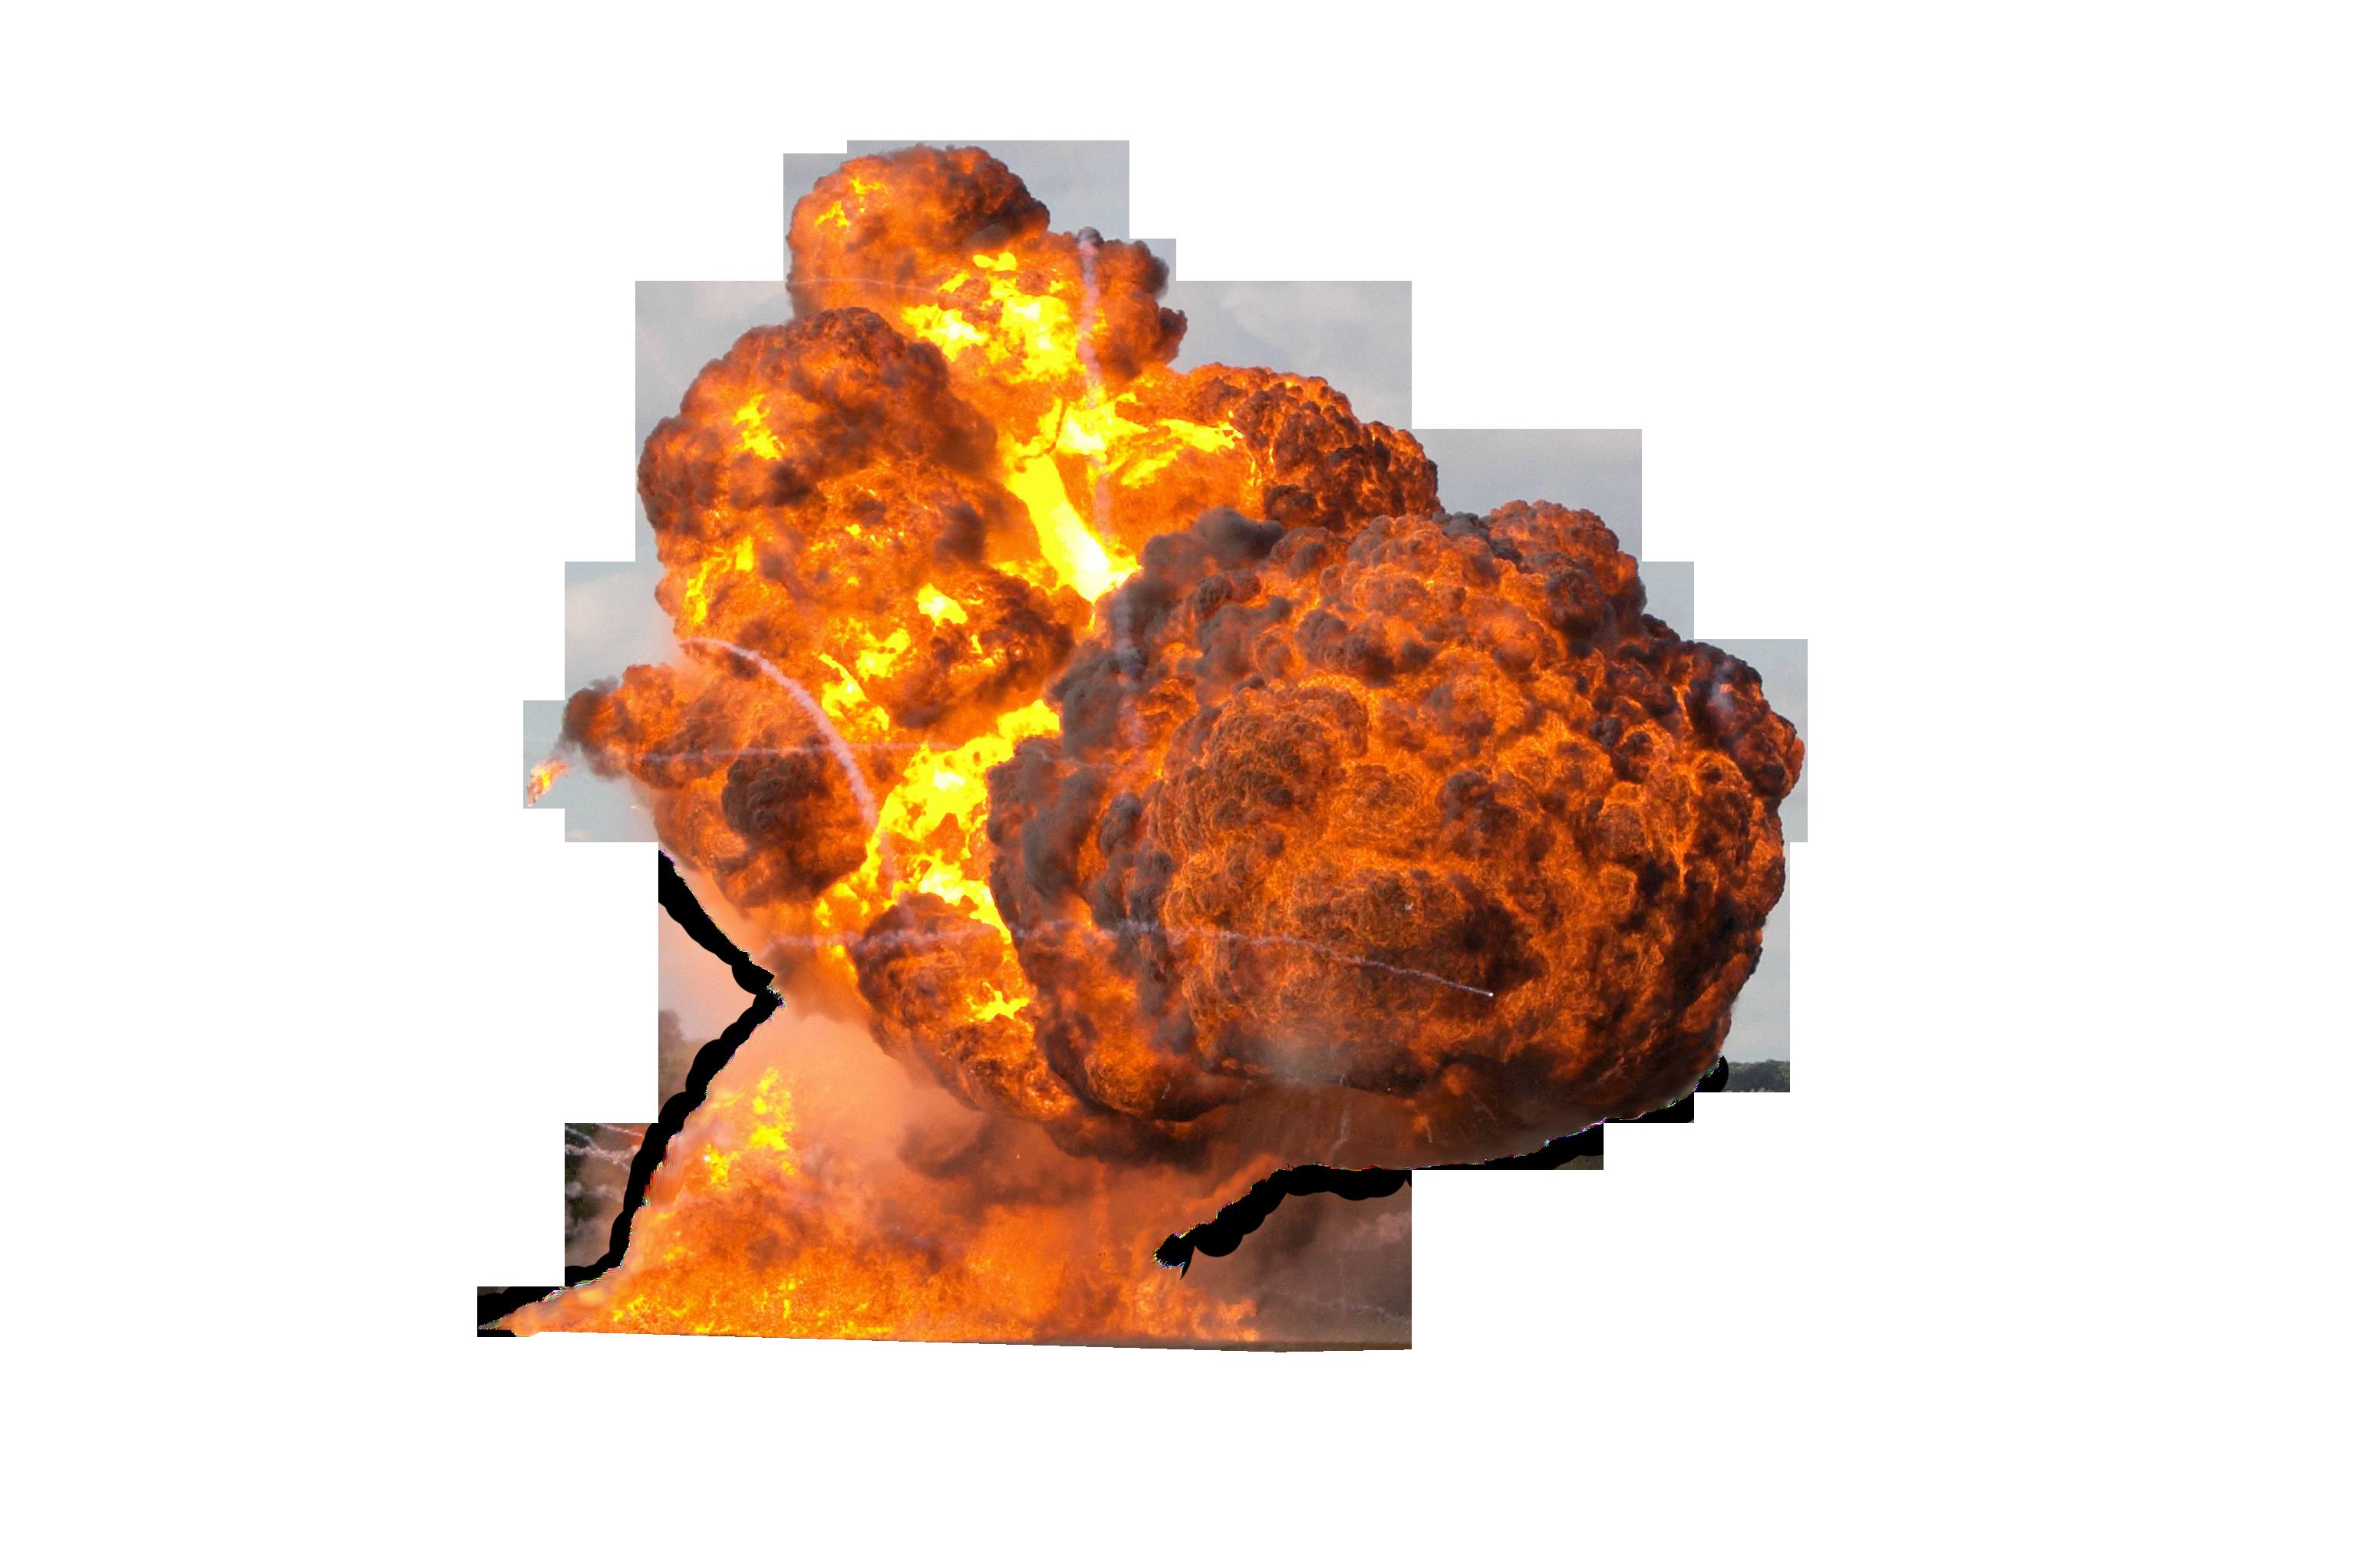 Explosion Transparent Png Images #45926